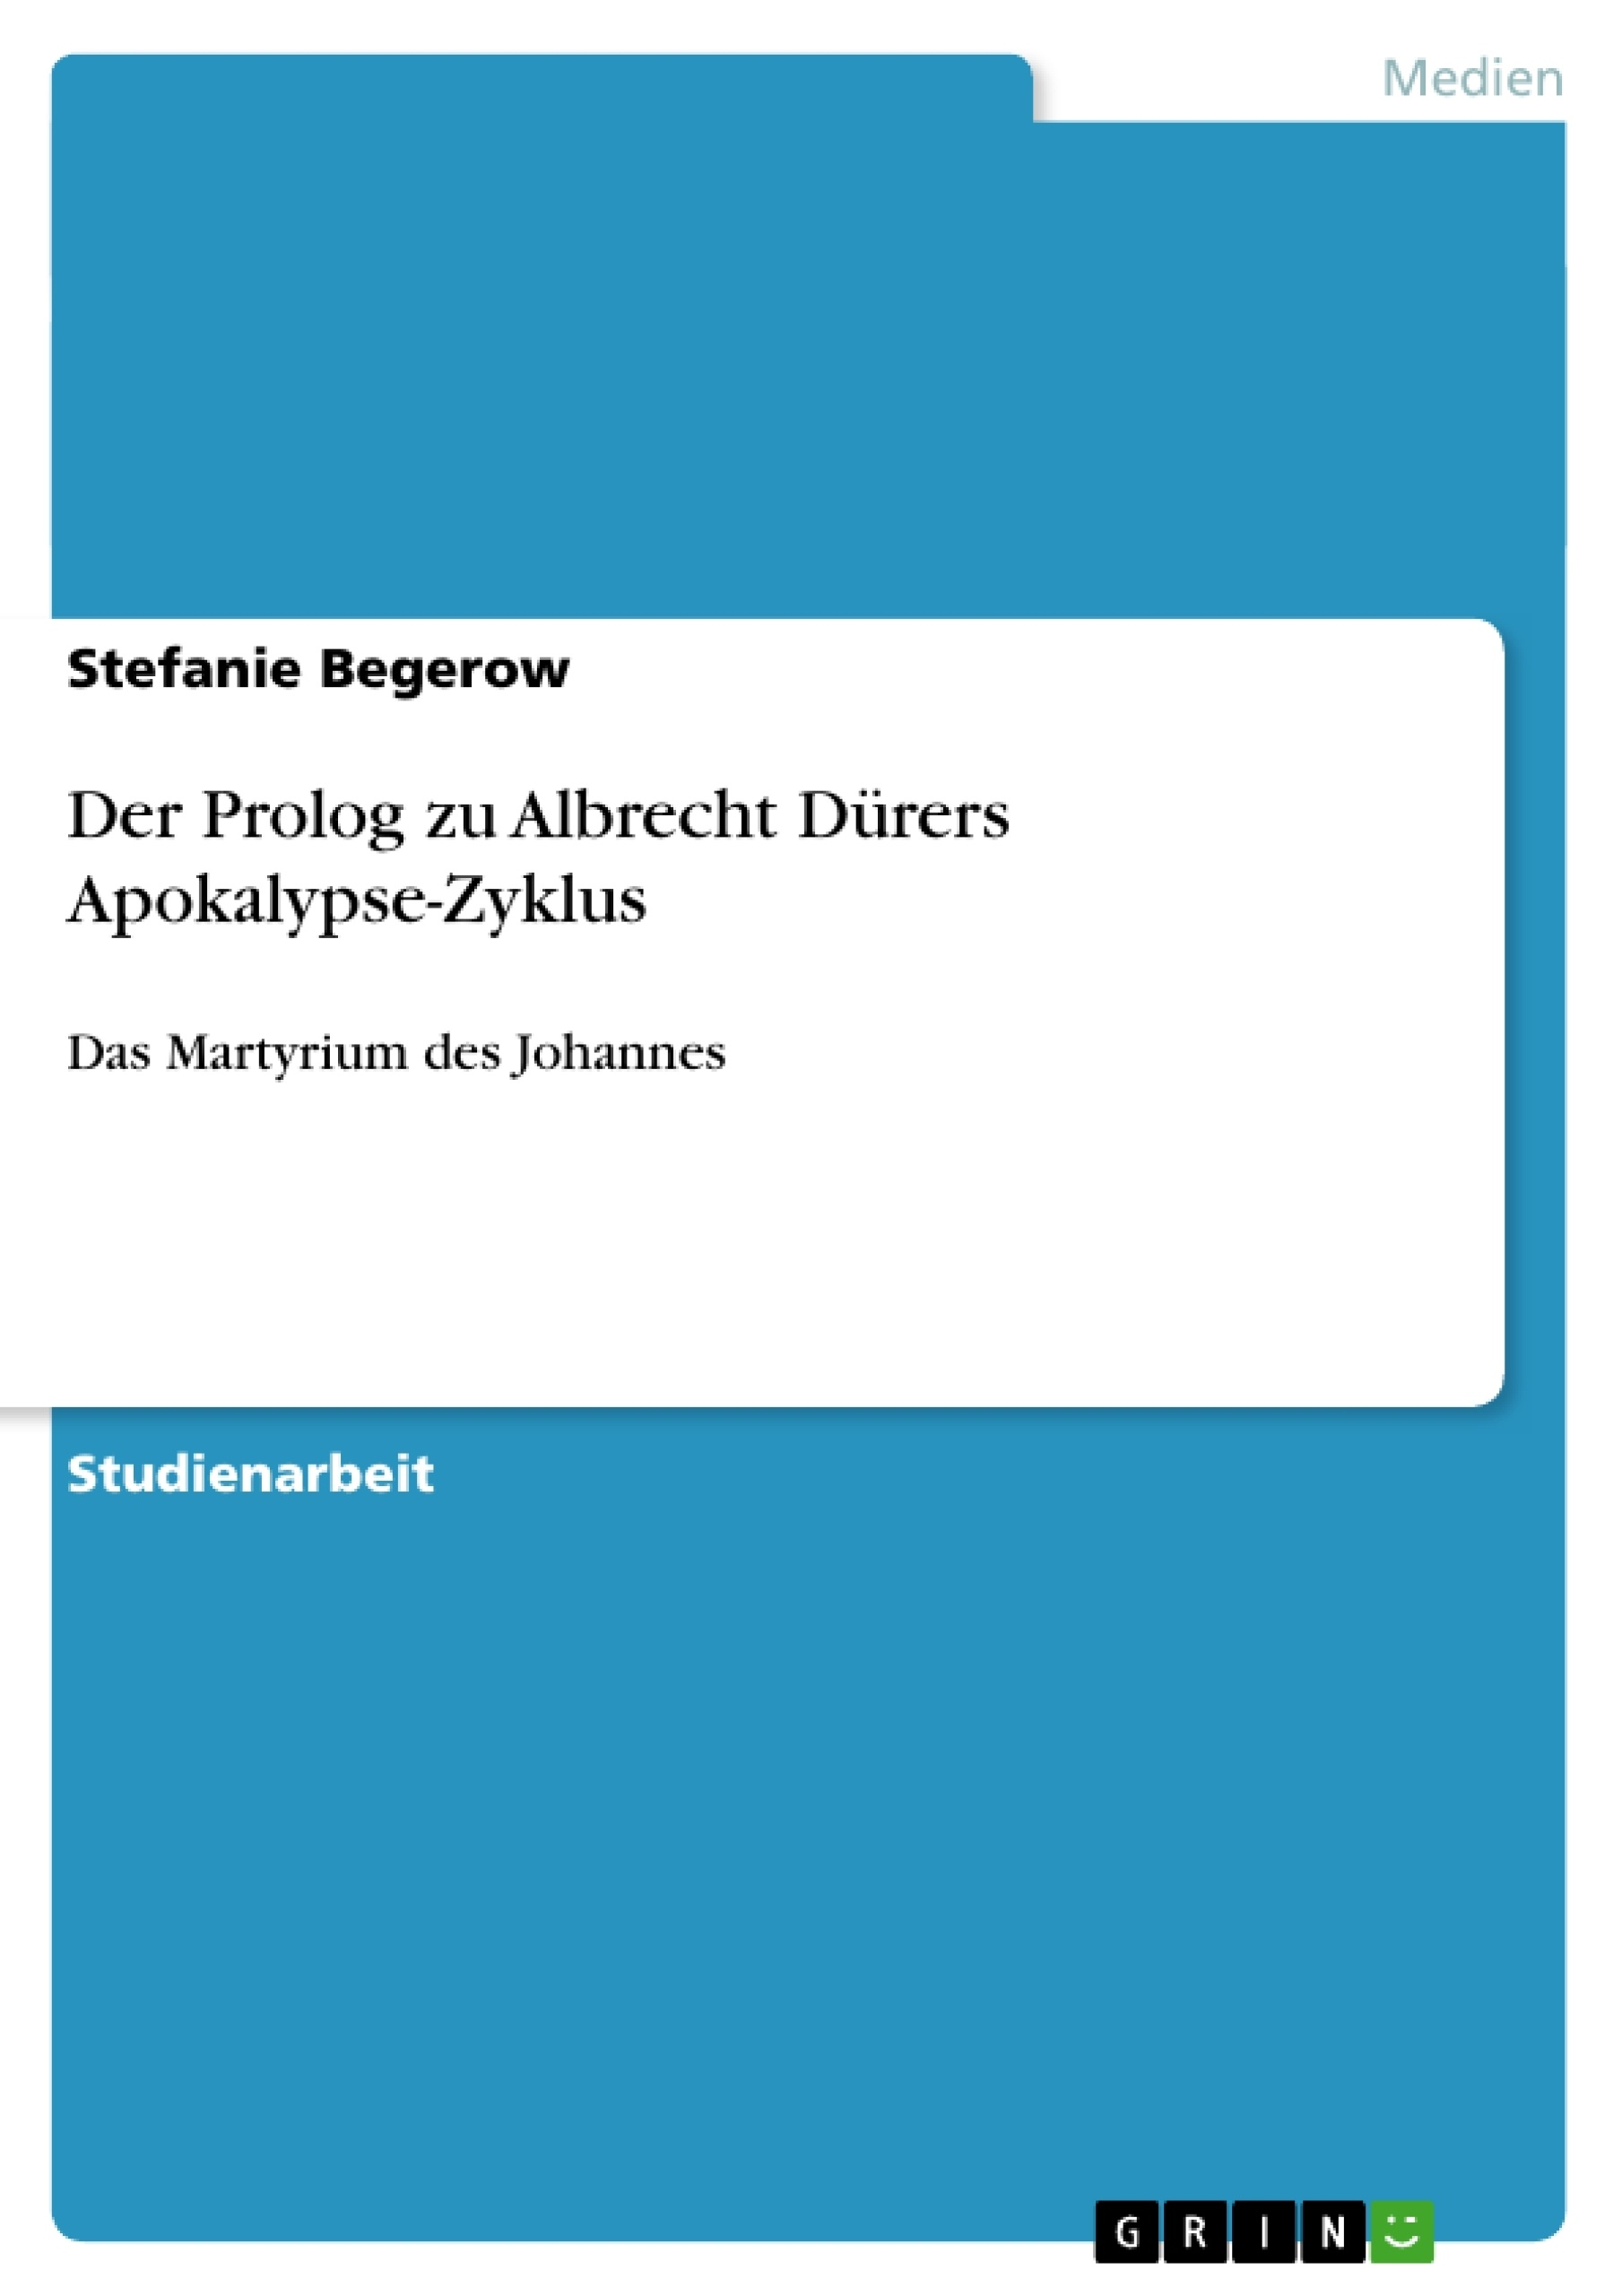 Titel: Der Prolog zu Albrecht Dürers Apokalypse-Zyklus